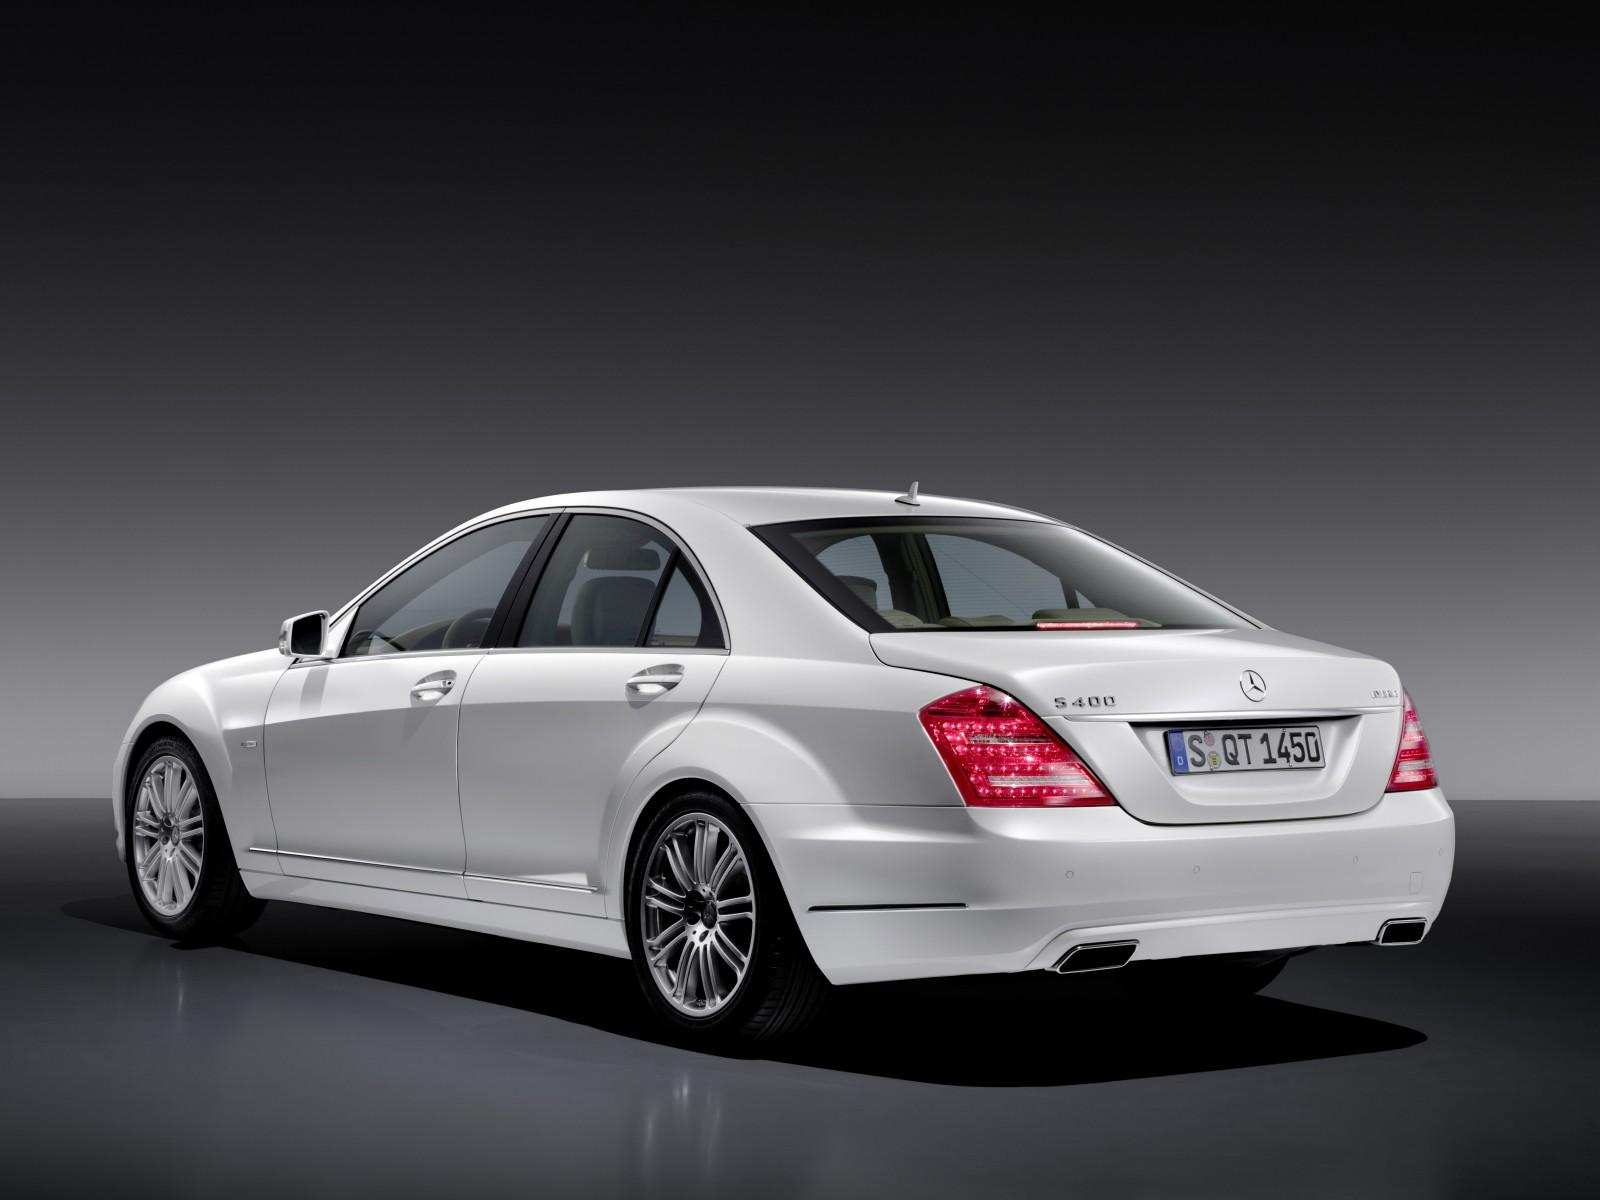 Mercedes benz s 400 hybrid technical details history for Mercedes benz hybrid uk